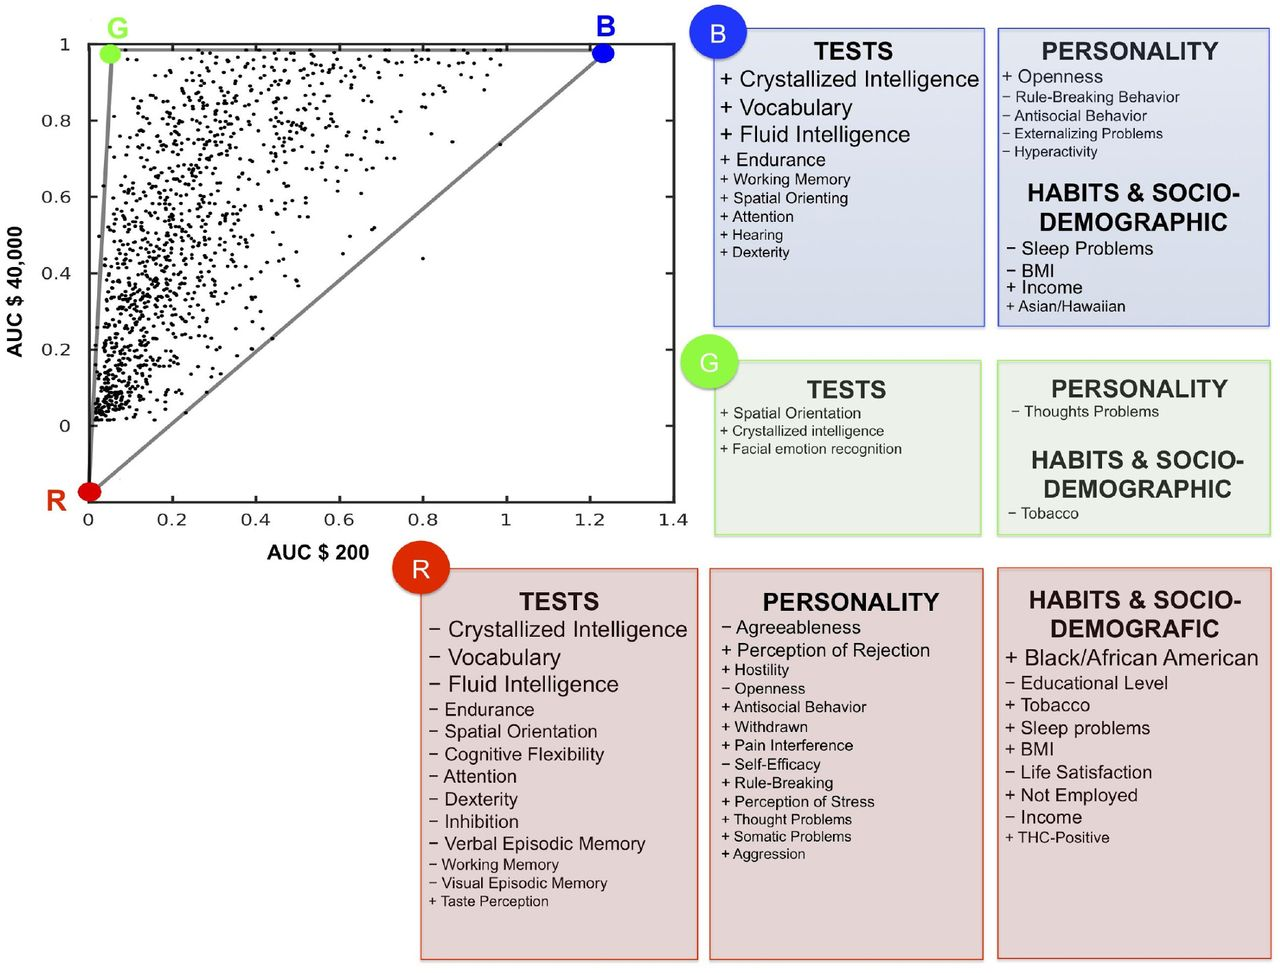 Archetypes in human behavior and their brain correlates: An